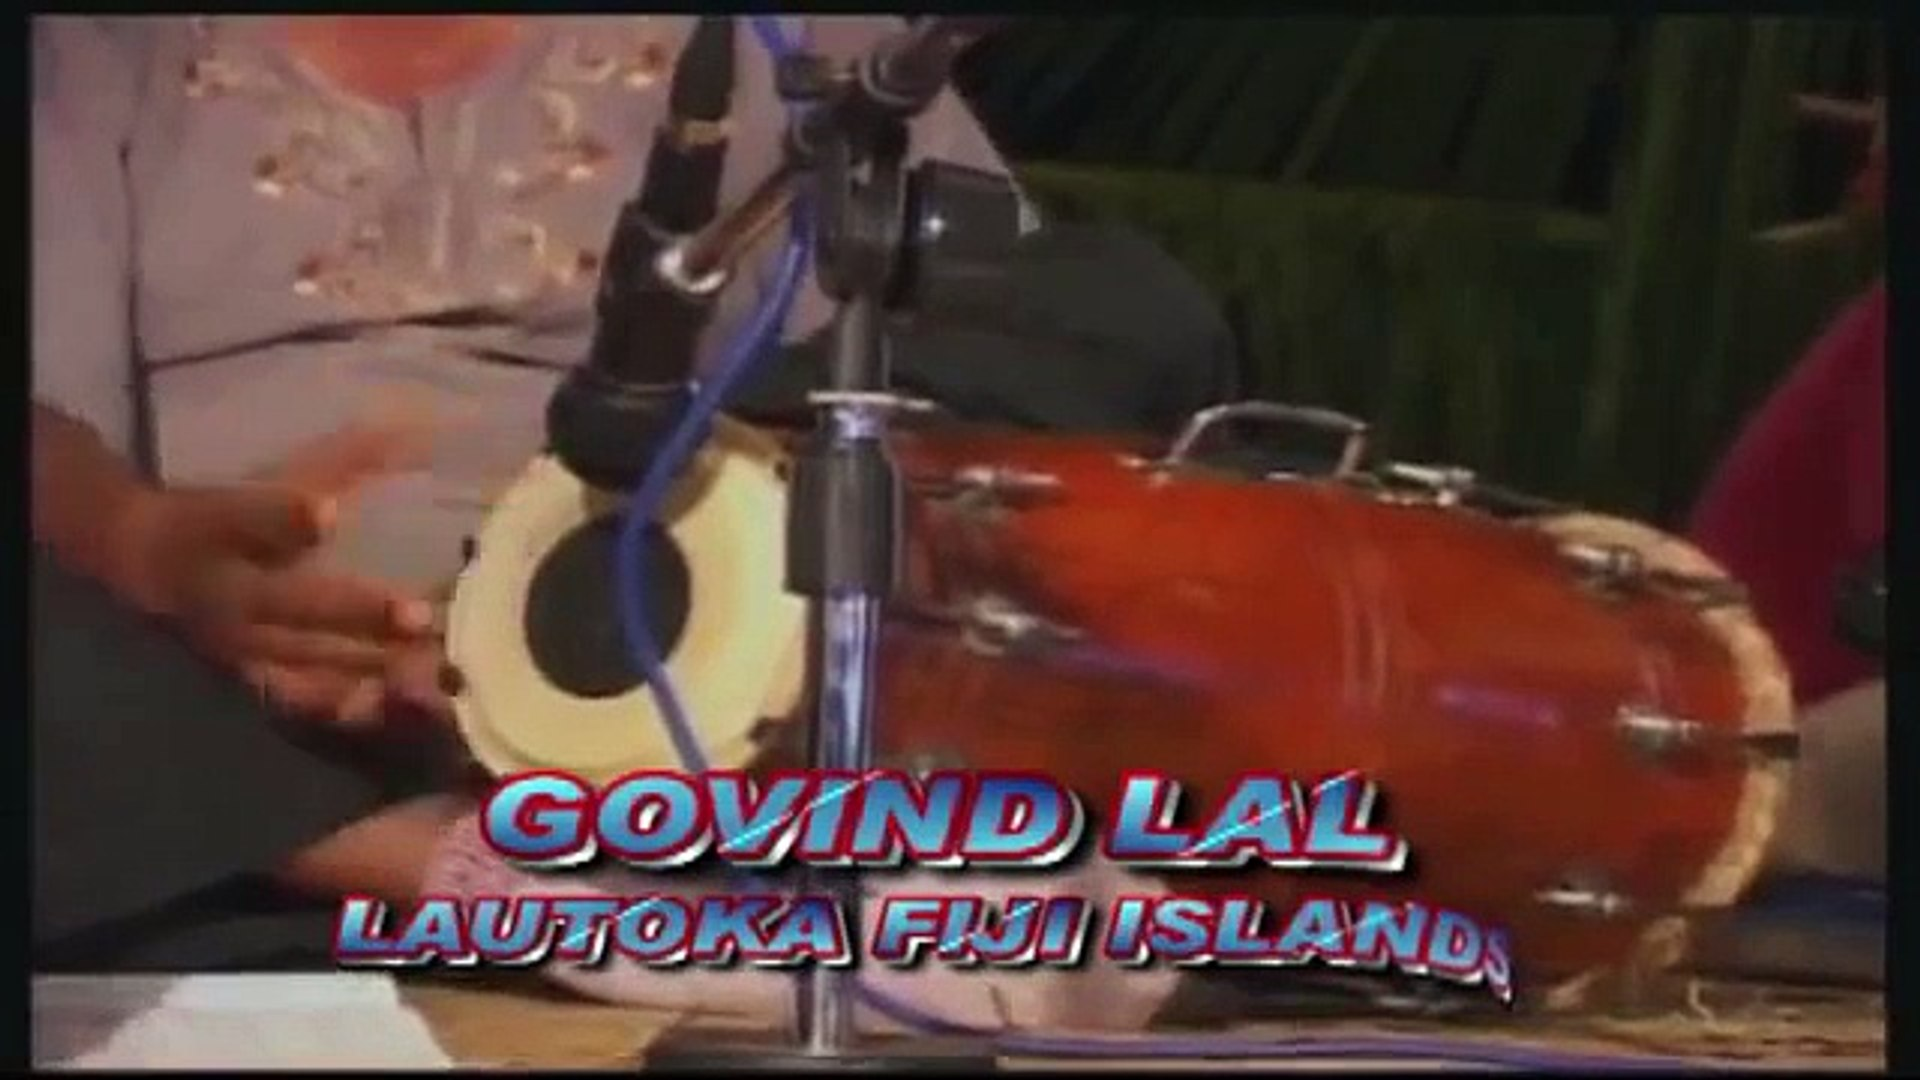 Fiji Kirtan Song: (Govind Lal of Lautoka Fiji Islands) by: rameshvideo@yahoo.com